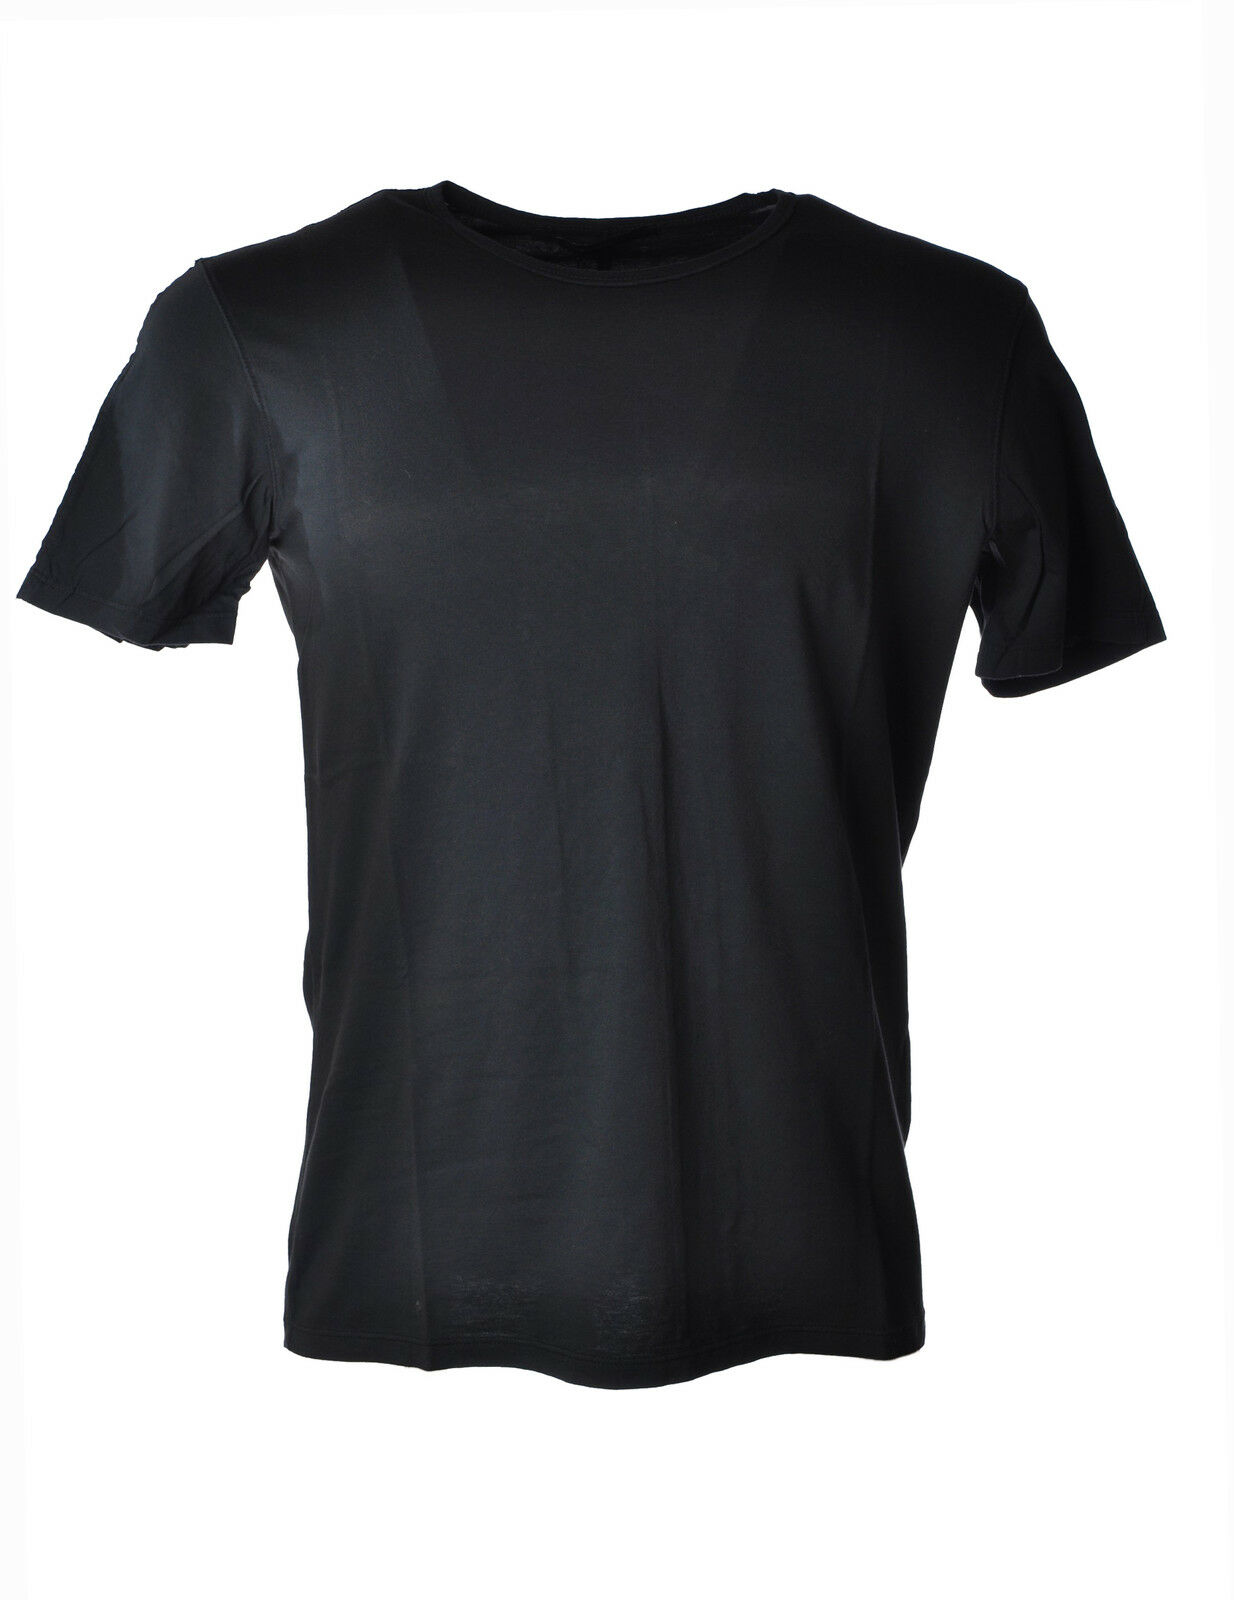 Messagerie - Topwear-T-shirts - Man - Blau - 3535703N182109